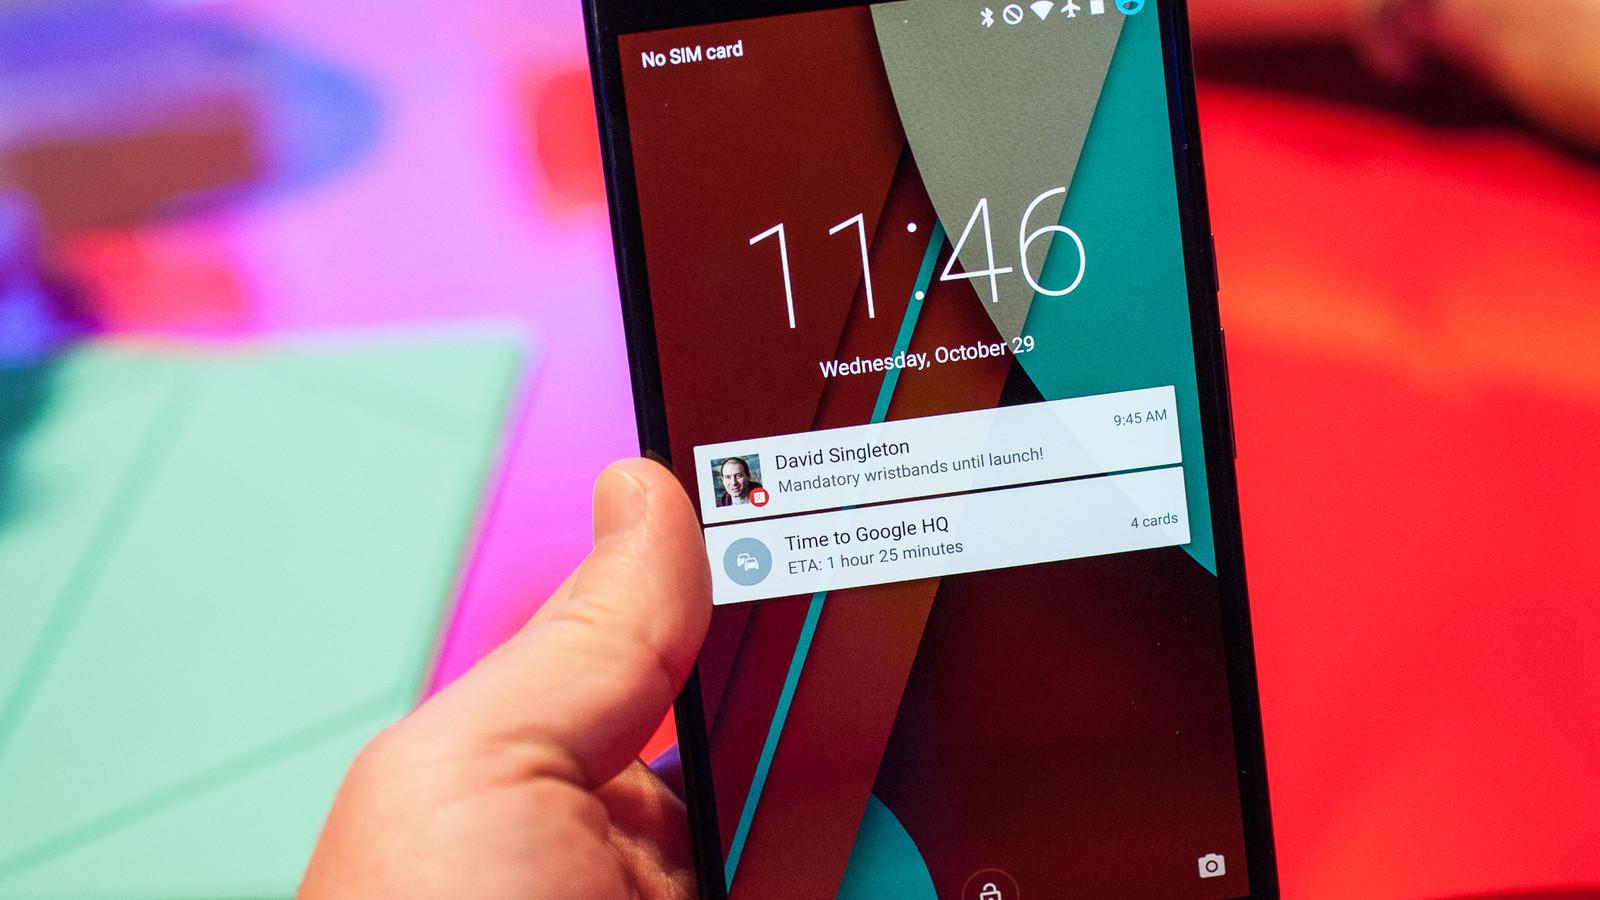 Nexus 6 interfaccia